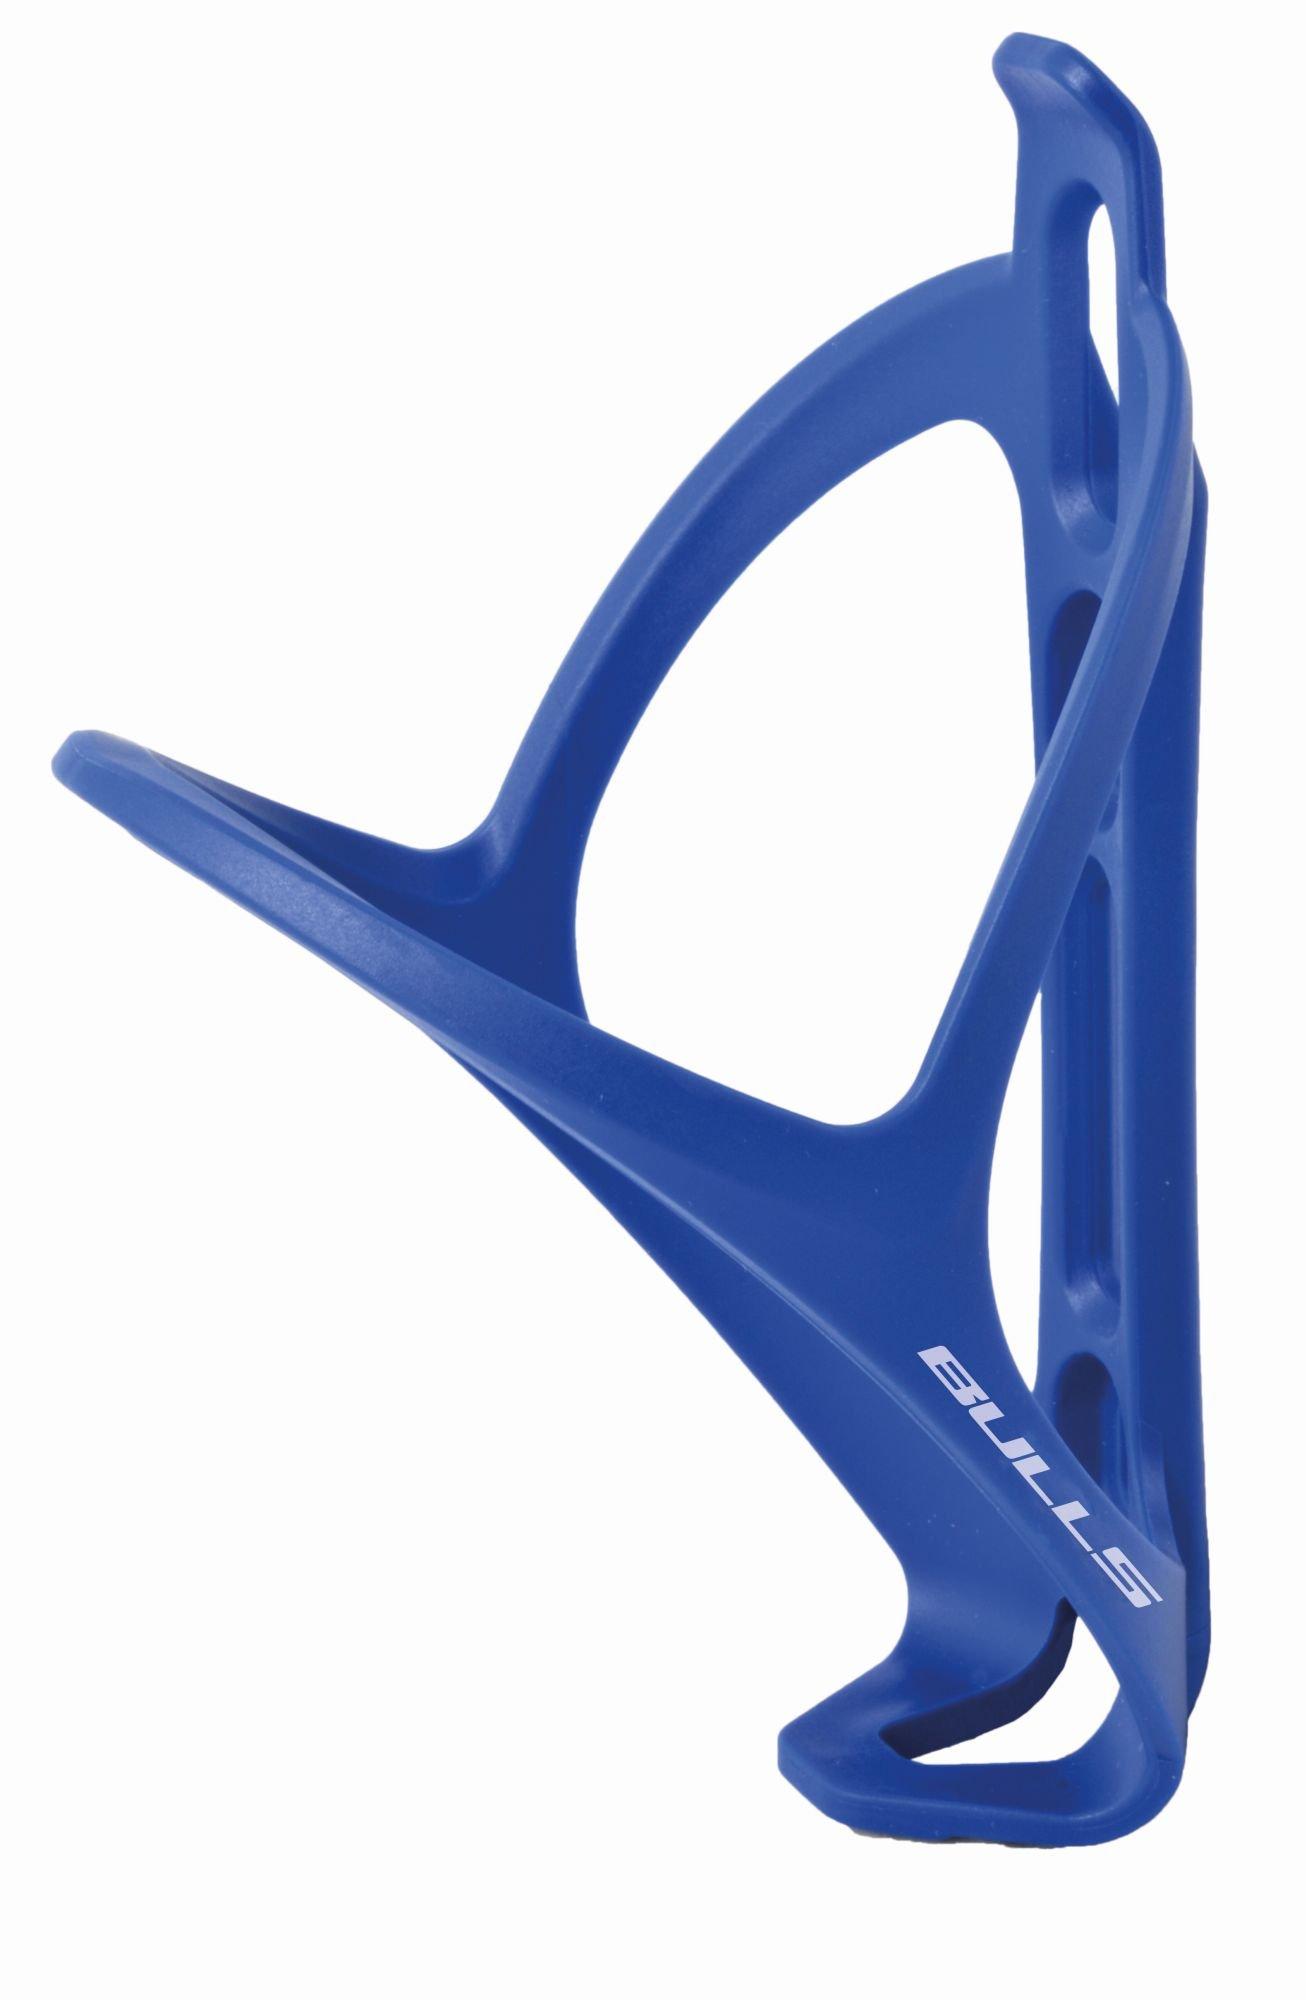 BULLS Flaschenhalter Kunststoff Cage blau blau matt